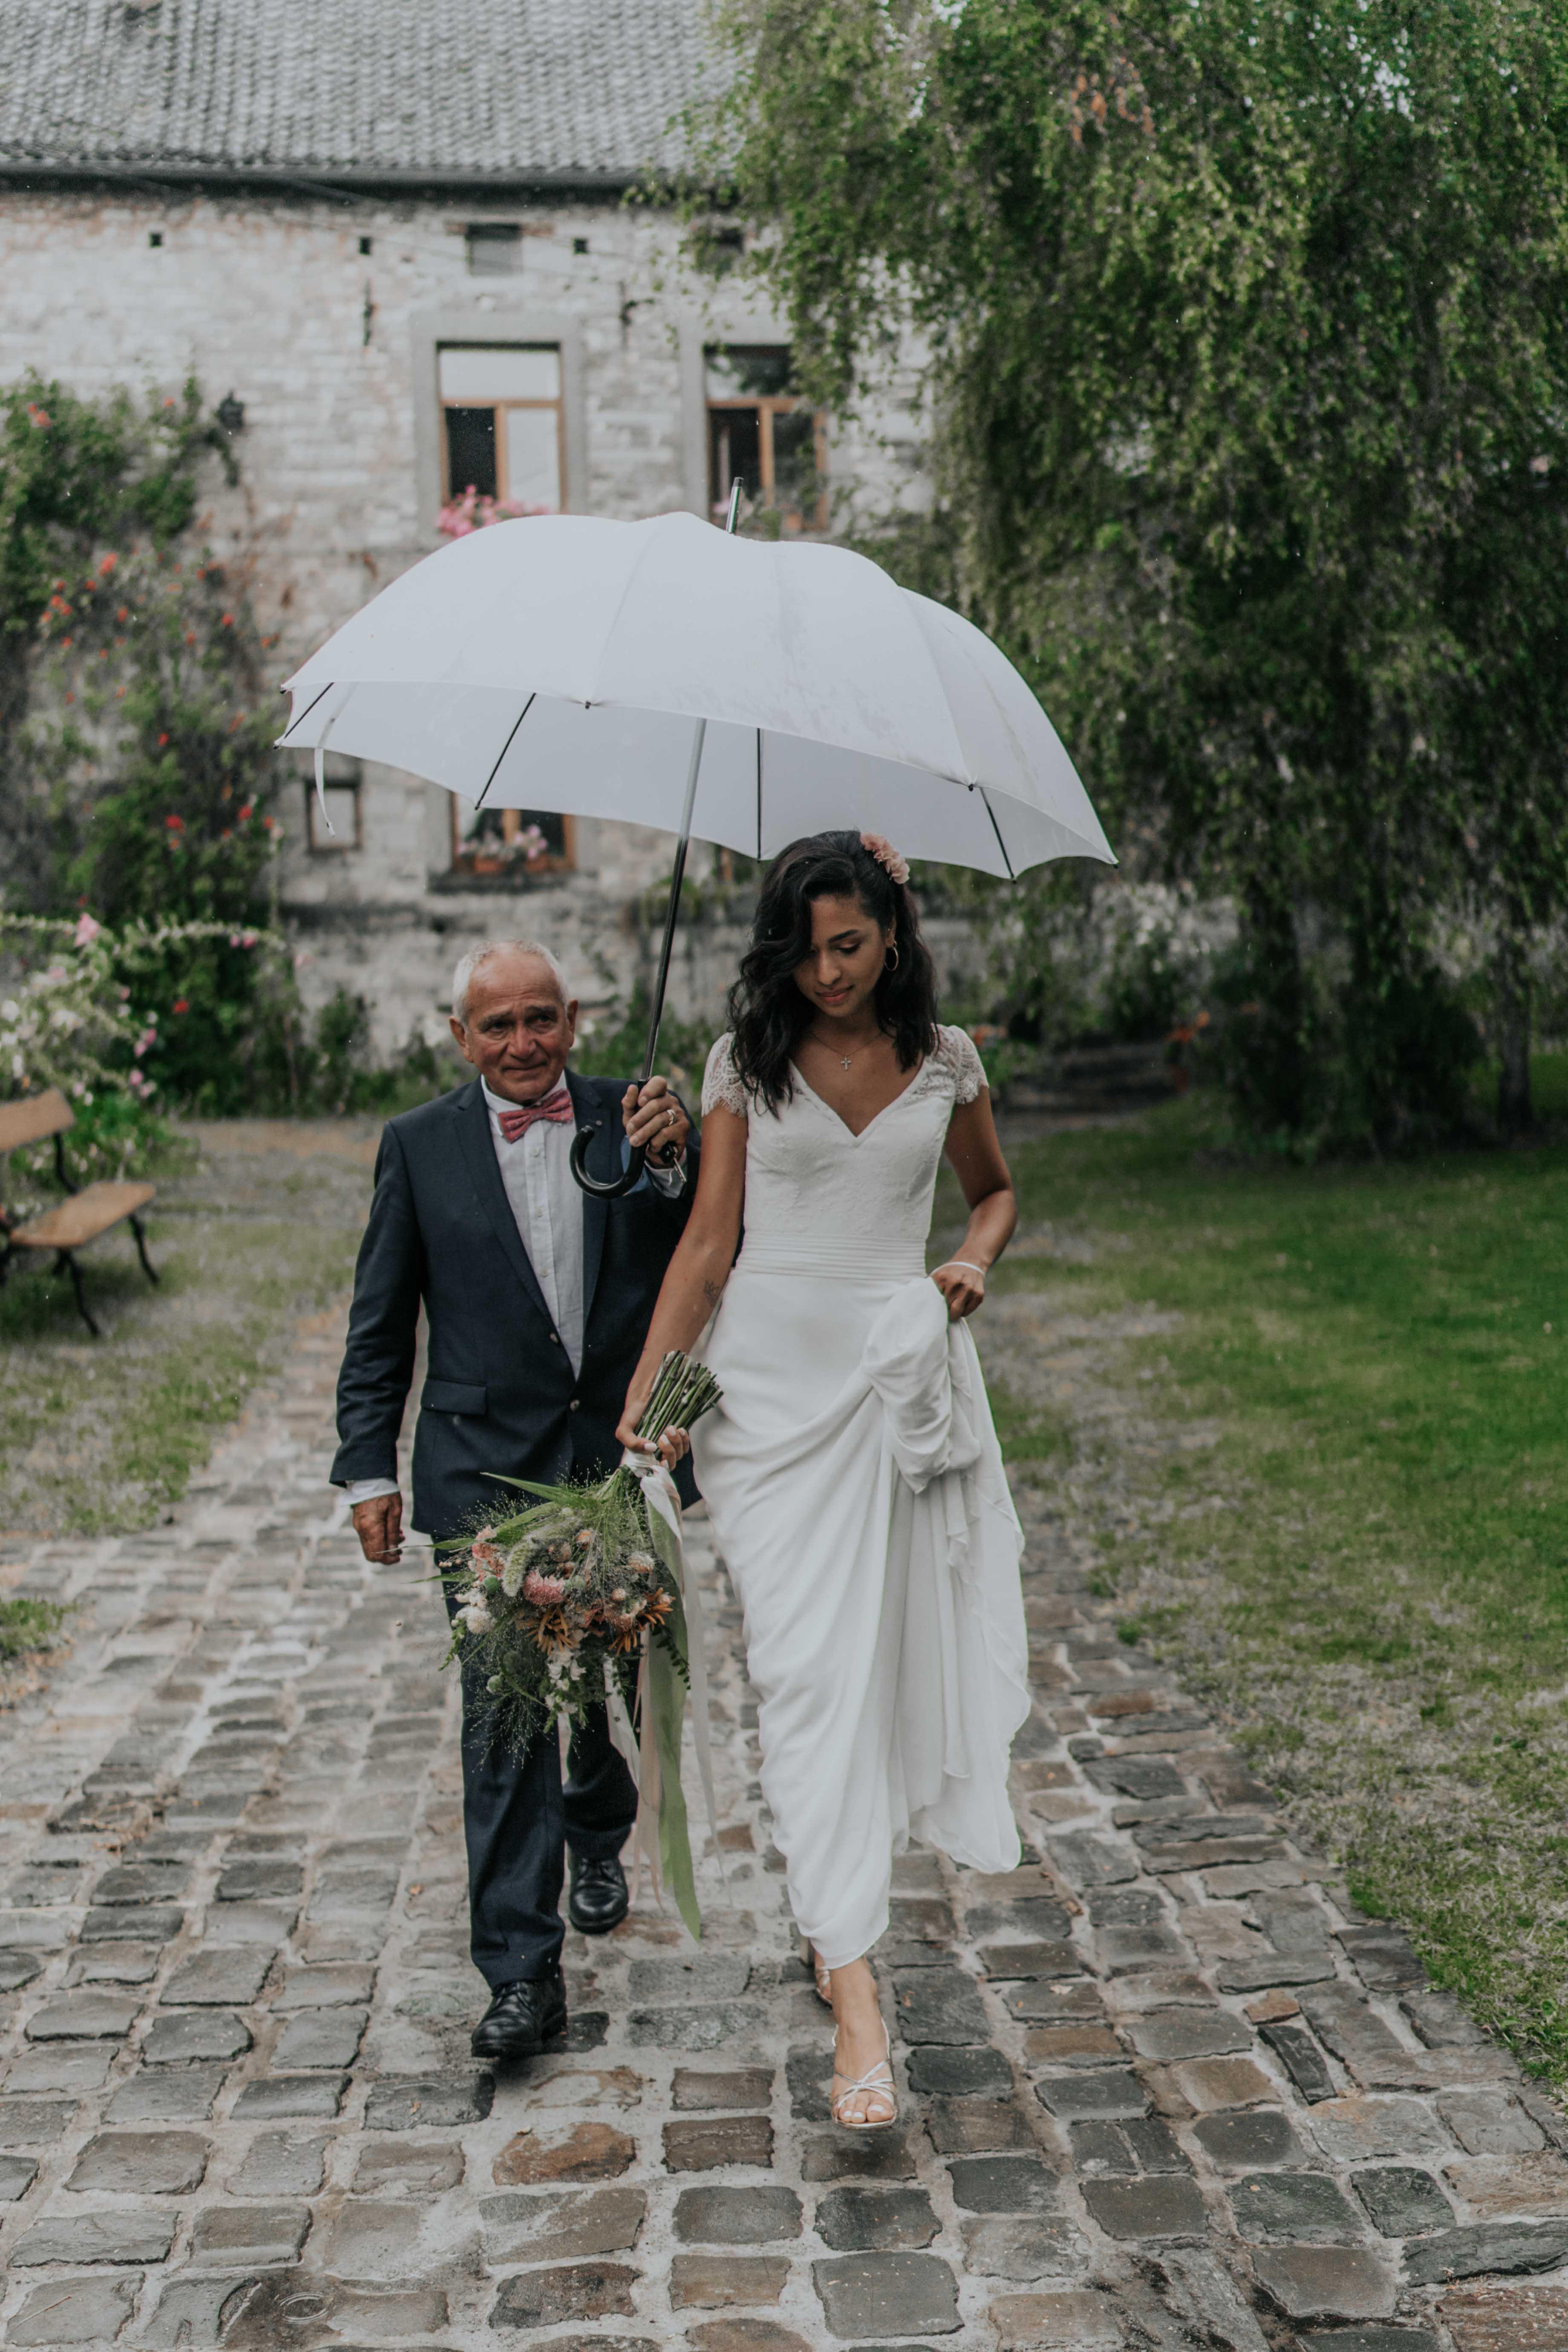 FANNY_MYARD_PHOTOGRAPHY_MARIAGE-45